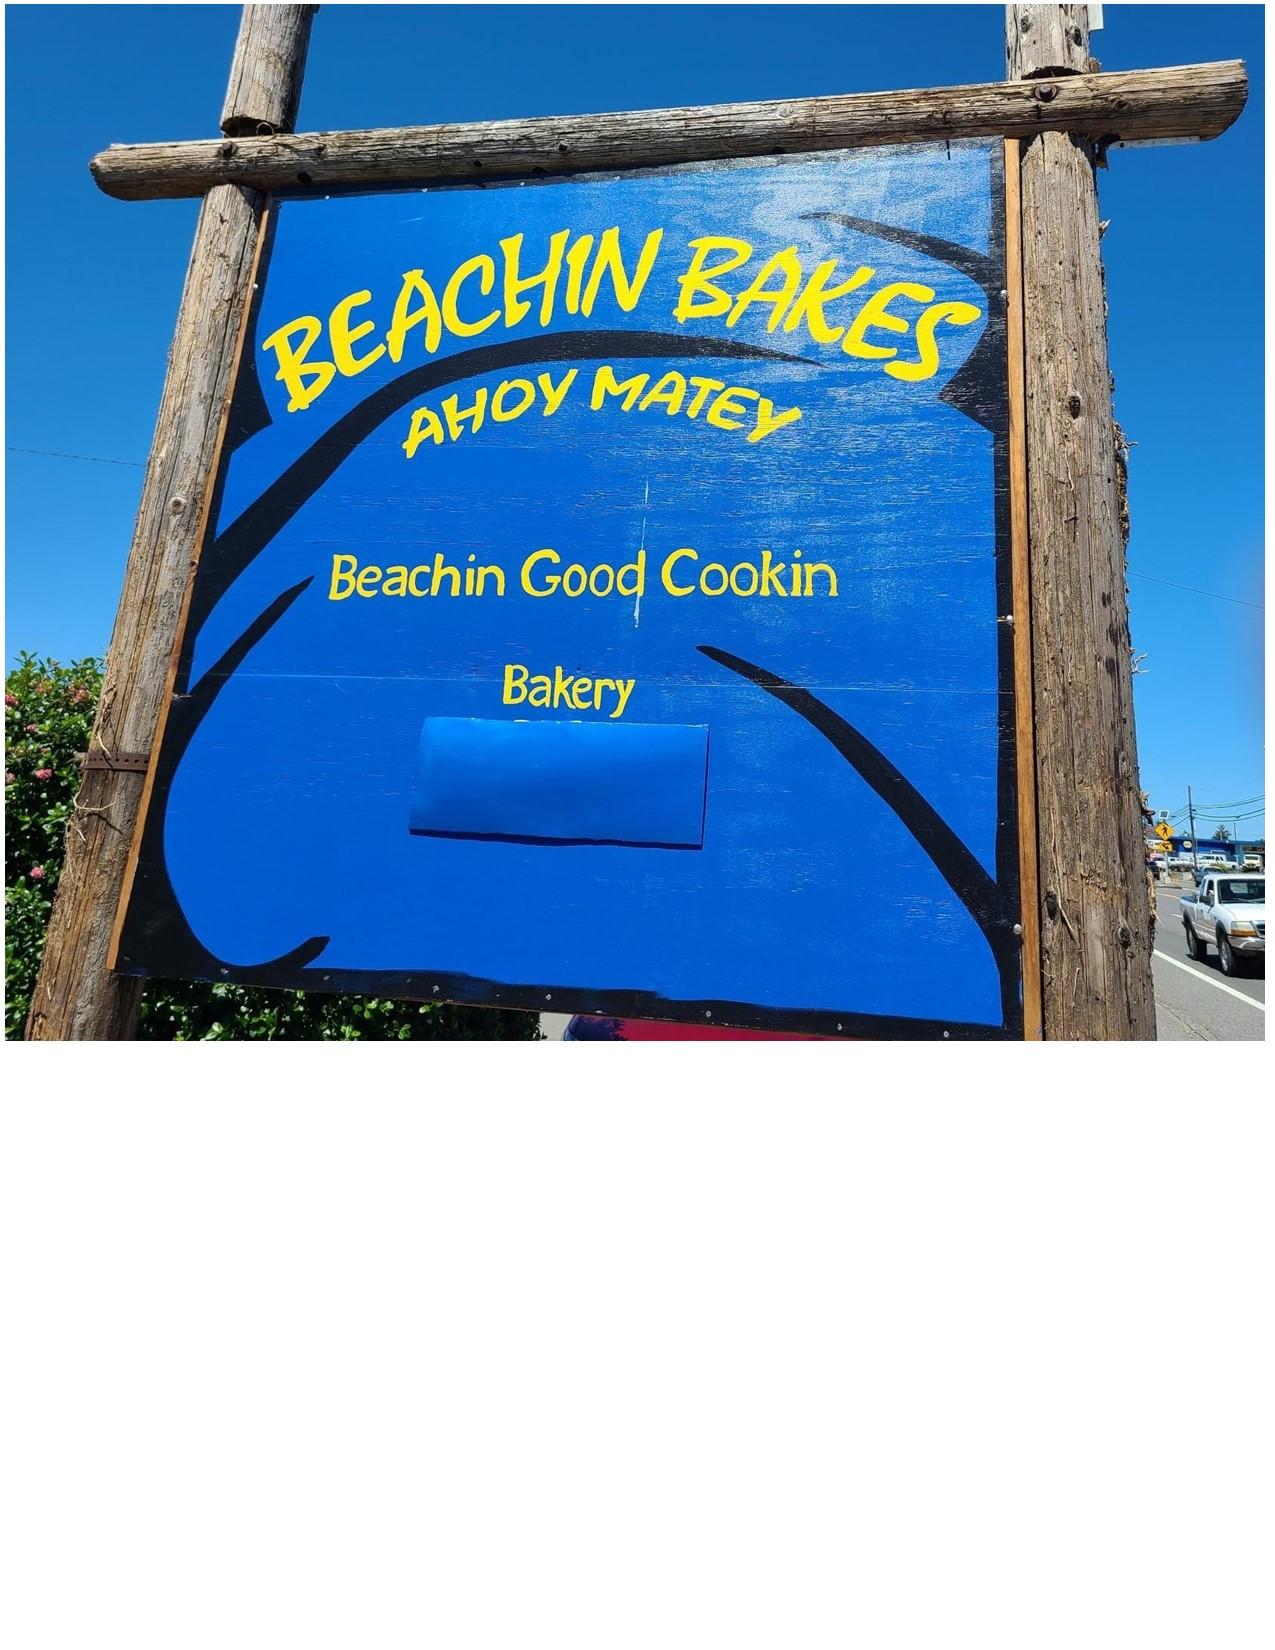 Beachin Bakes outside sign-pub.jpg